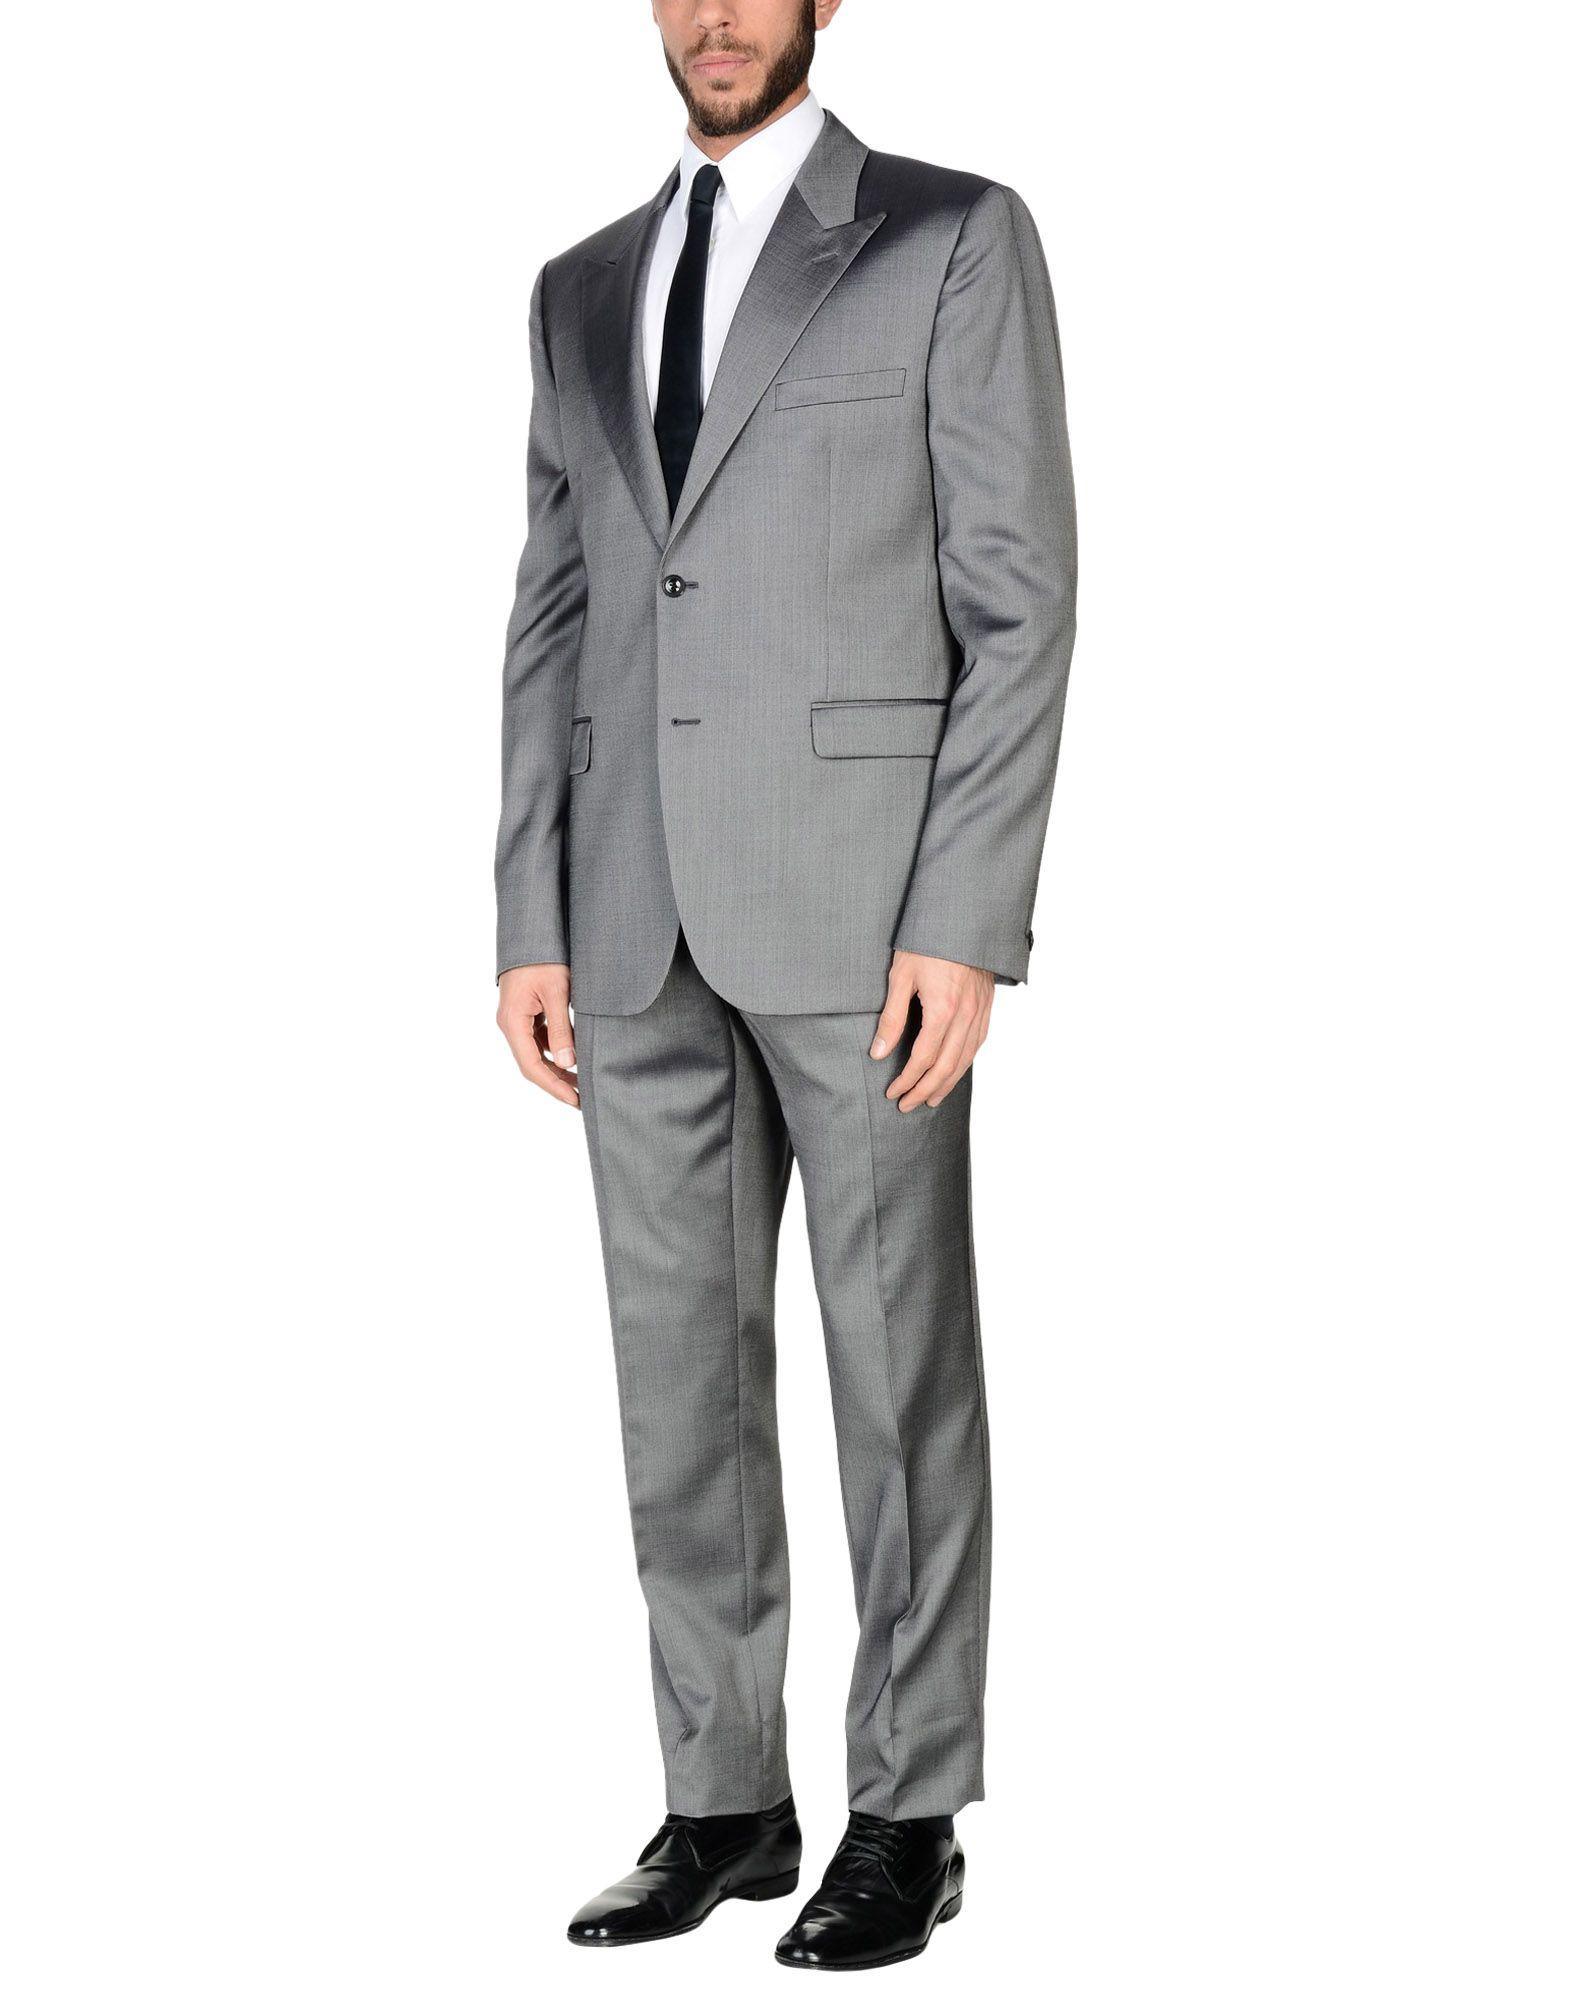 Versace Suits In Grey